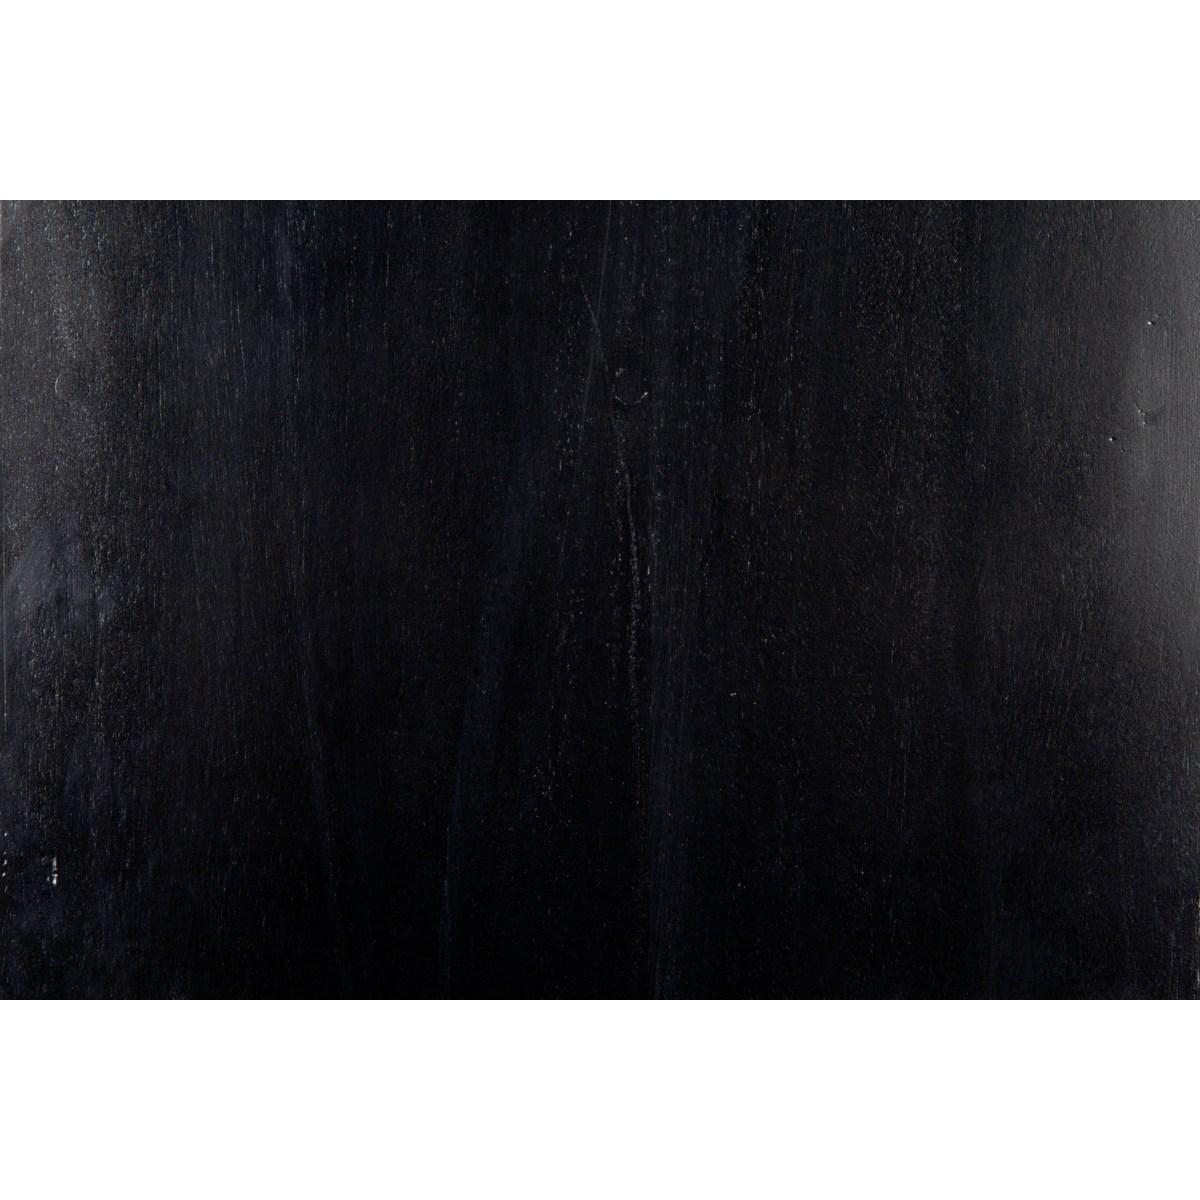 Savant Bookcase, Hand-Rubbed Black